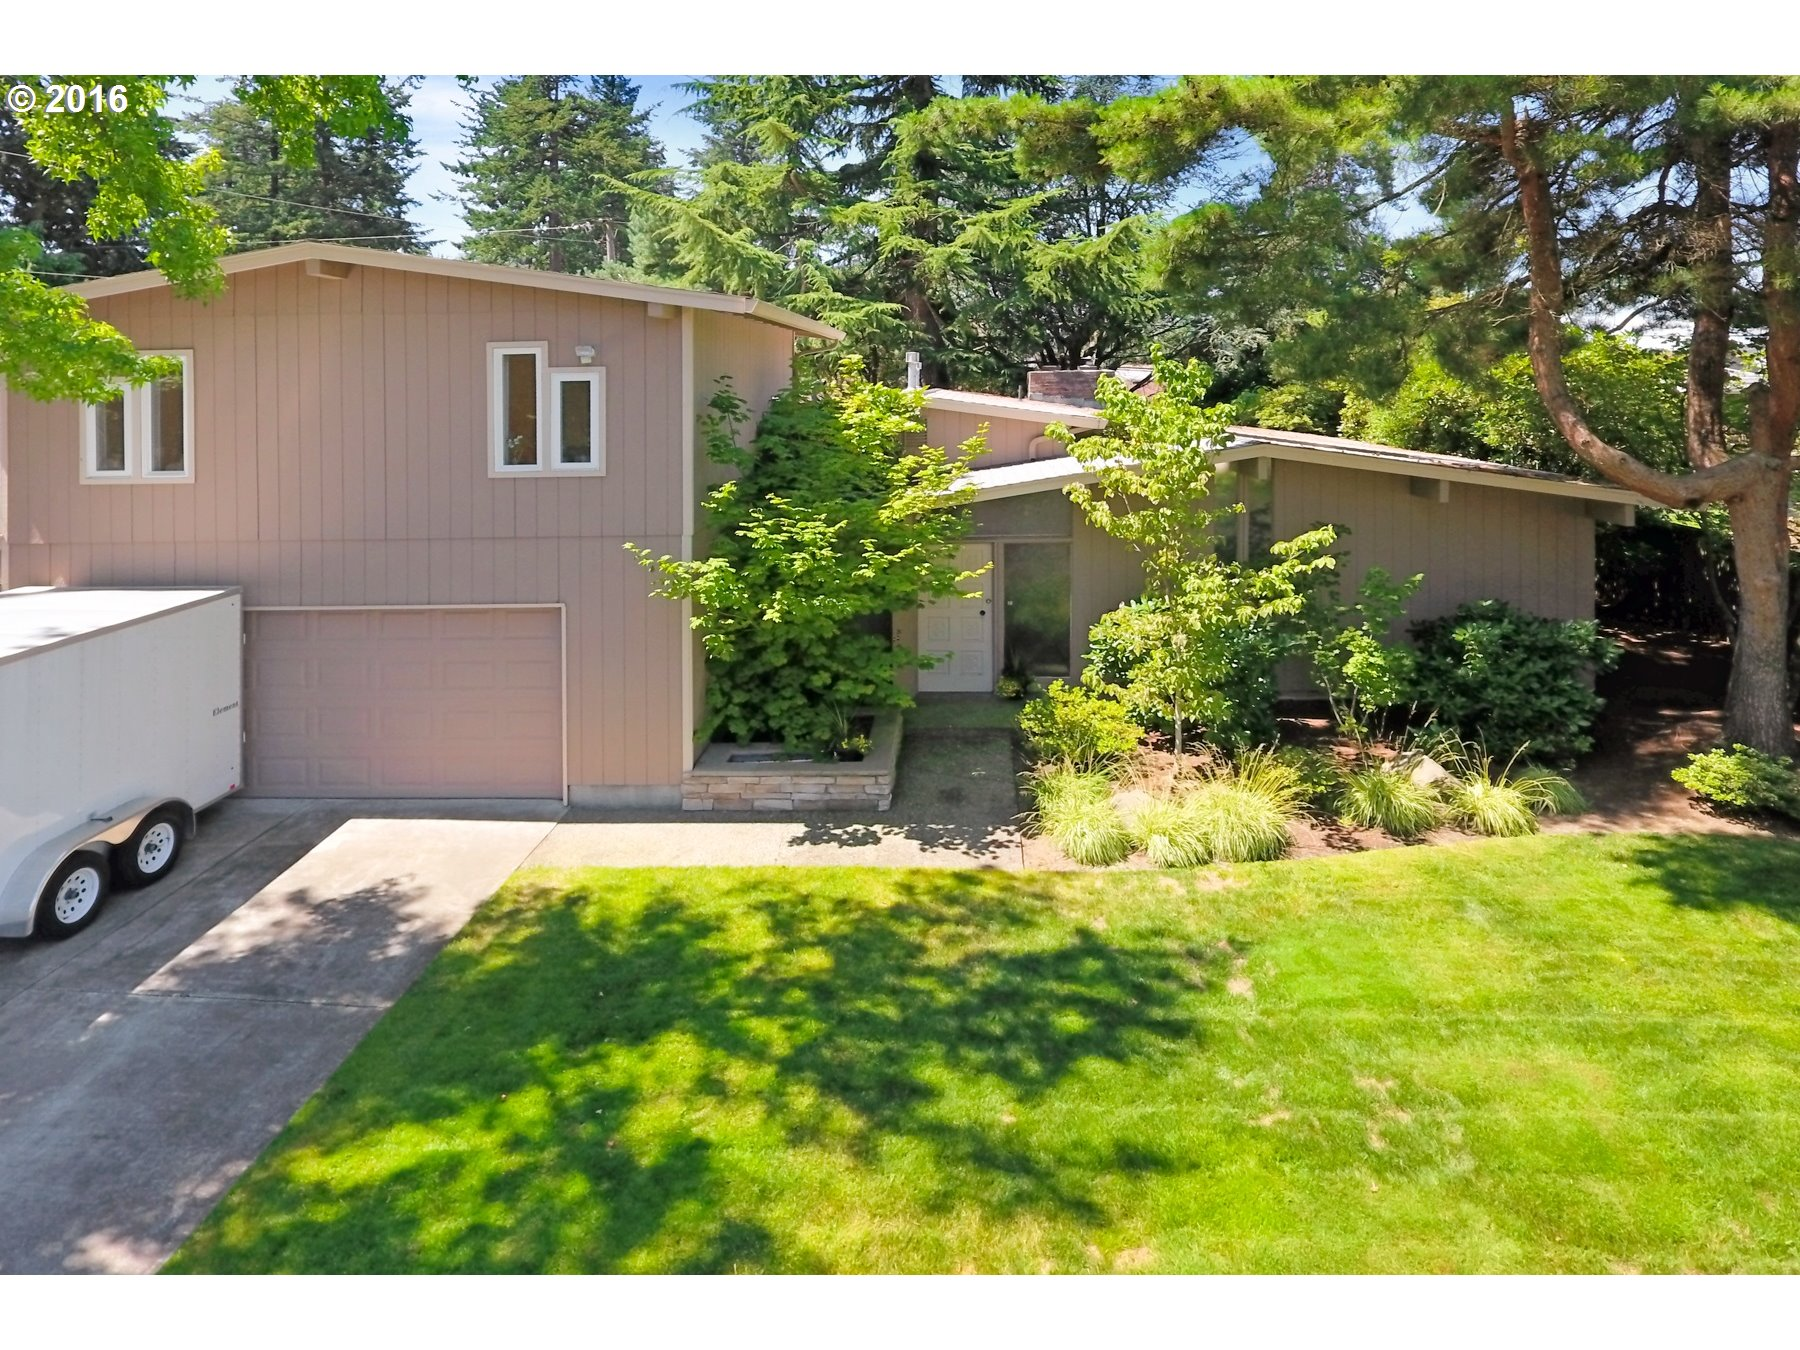 $350,000 - 3Br/2Ba -  for Sale in Wilkes East, Portland